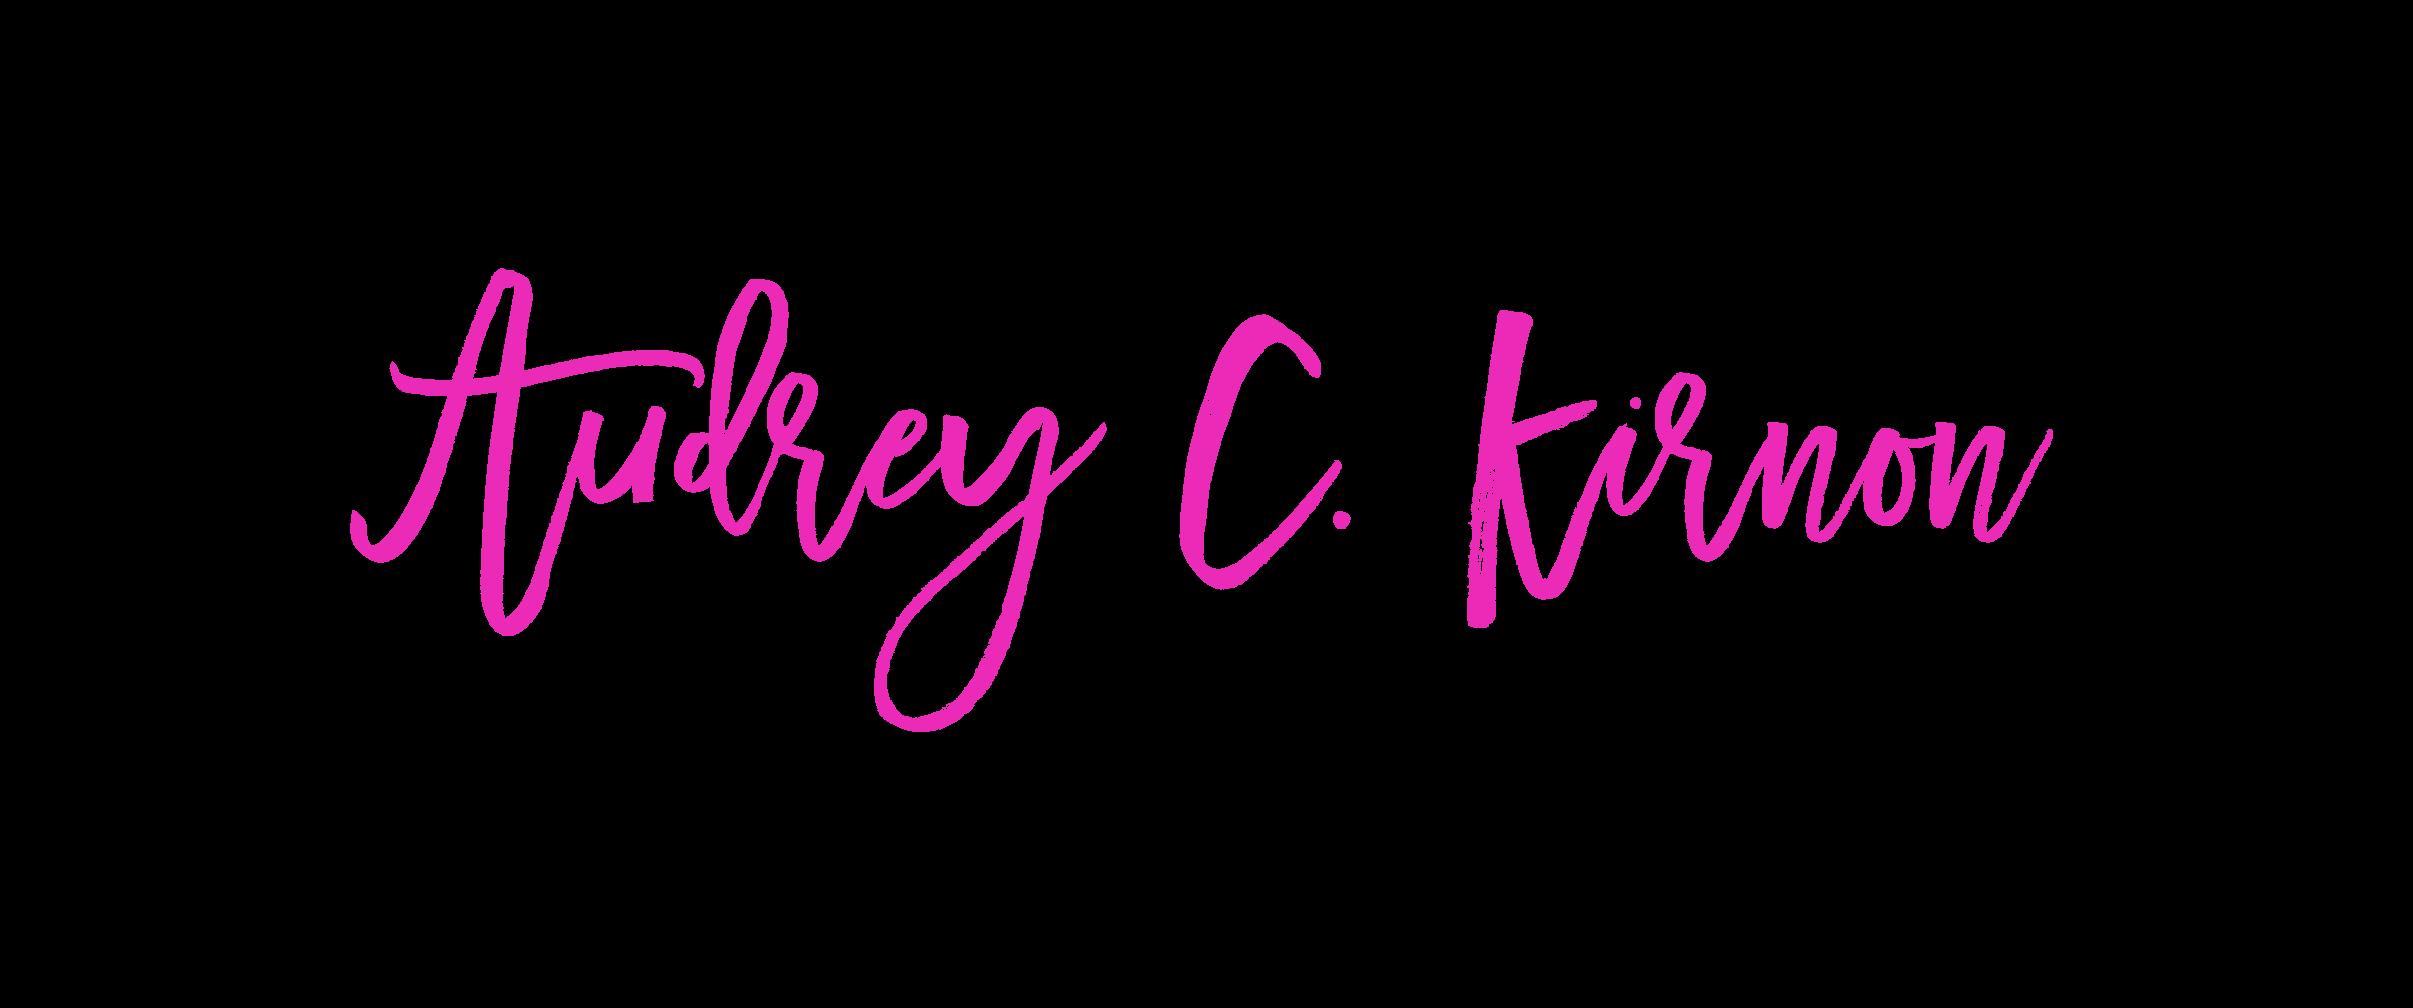 audreyck4 2019 sig logo.png